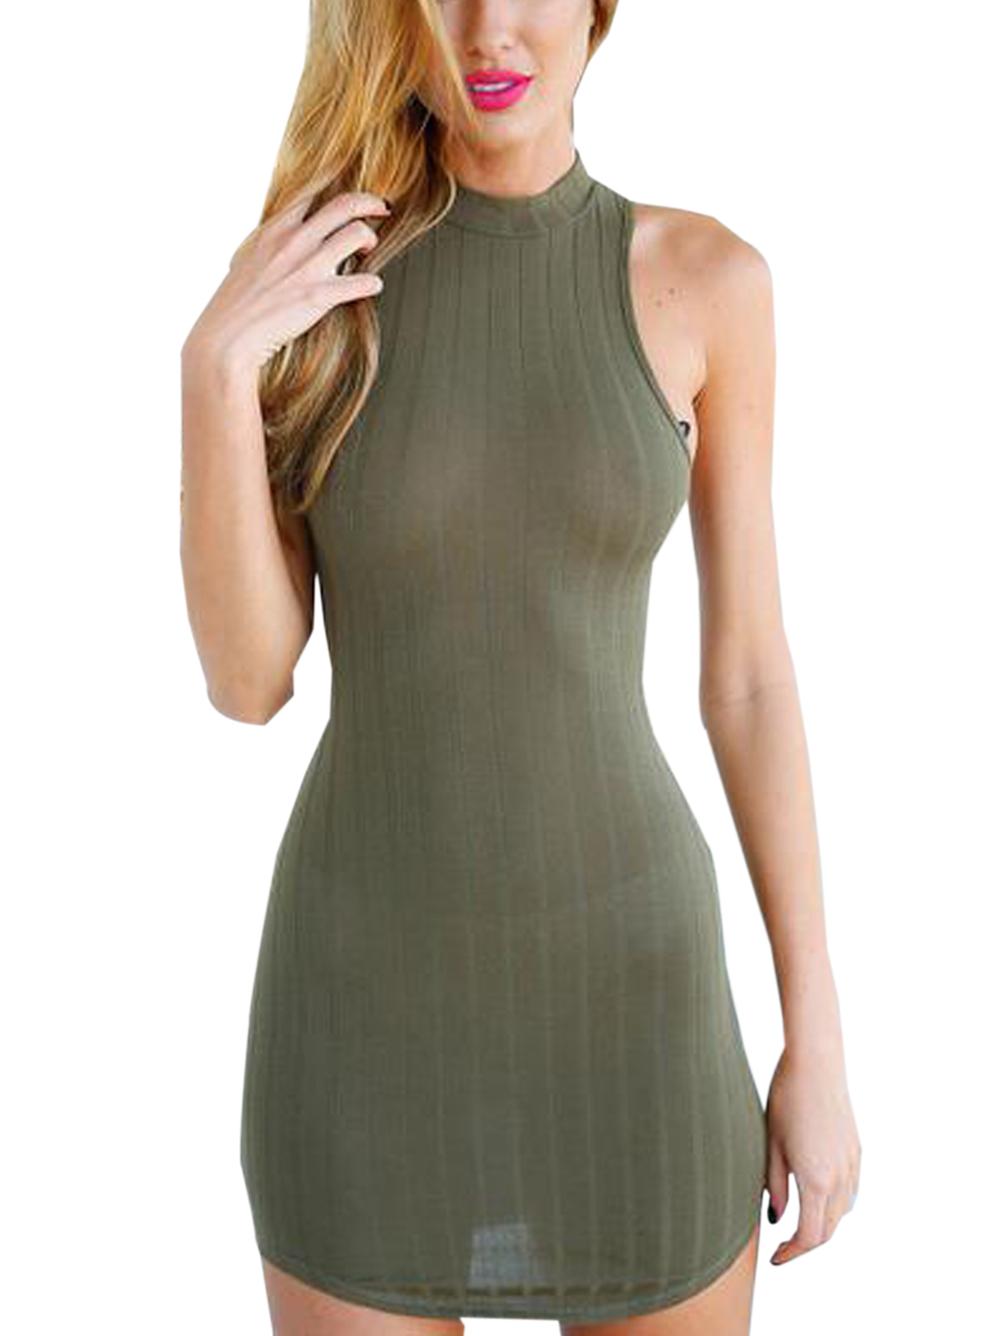 pinay topless selfie com